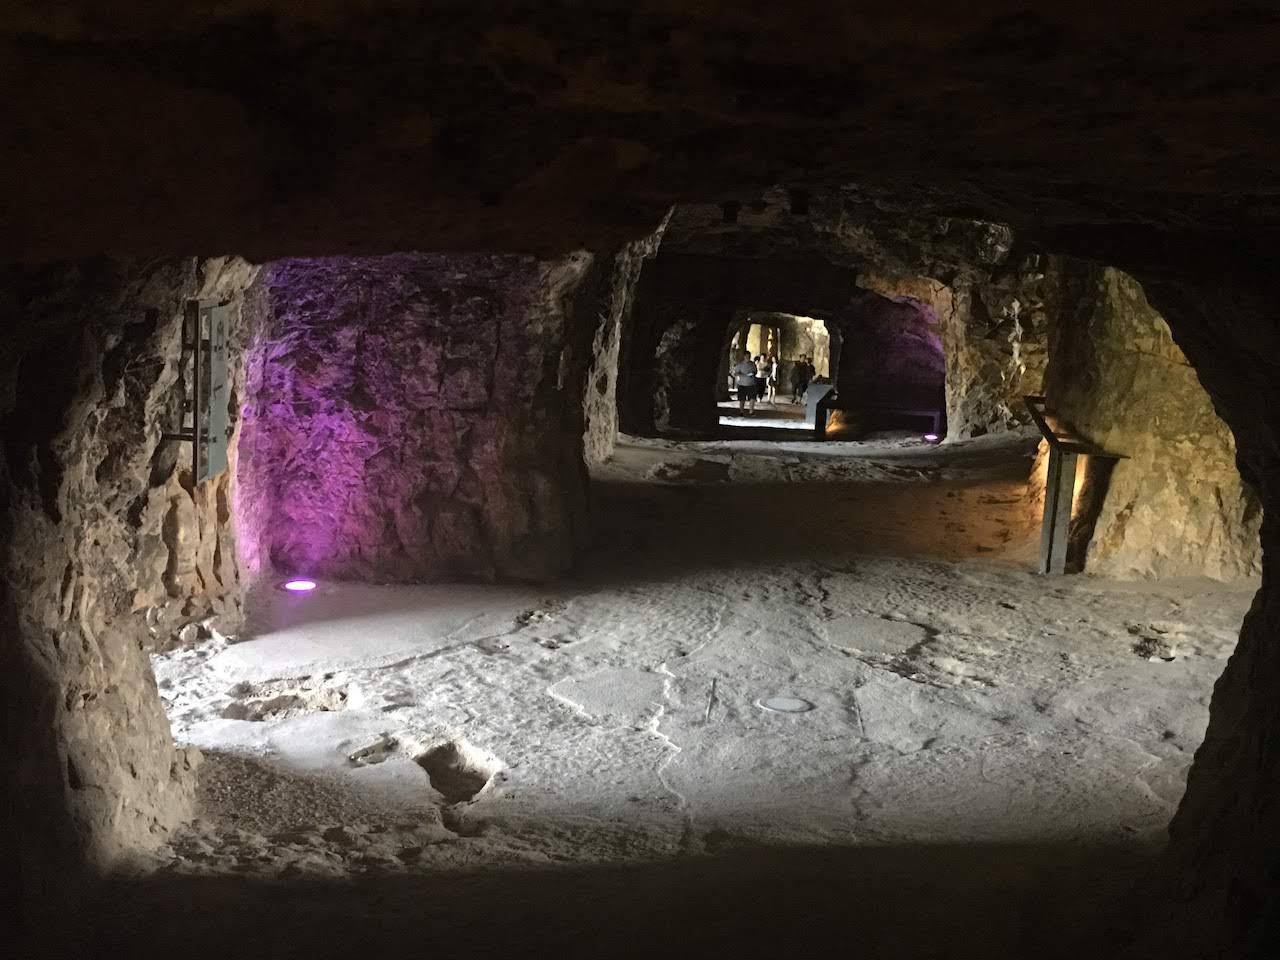 Inside Bock Casemates, Luxembourg